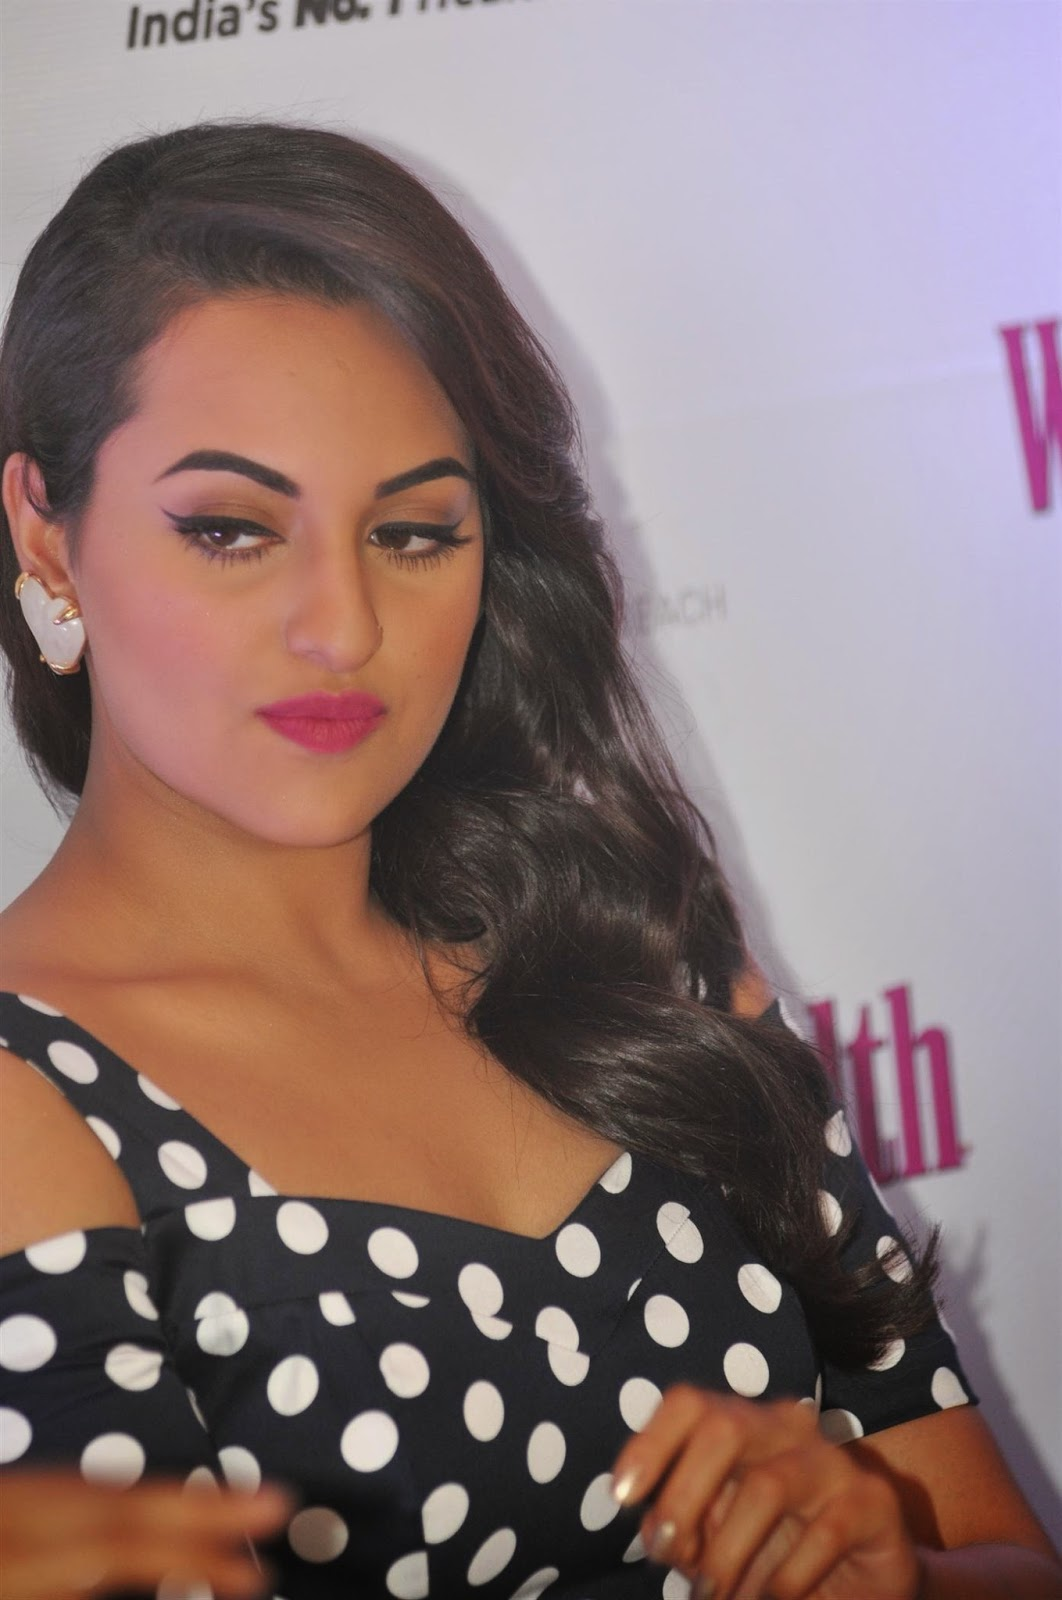 Sonakshi Sinha Sad Looking Photos In Black Dress